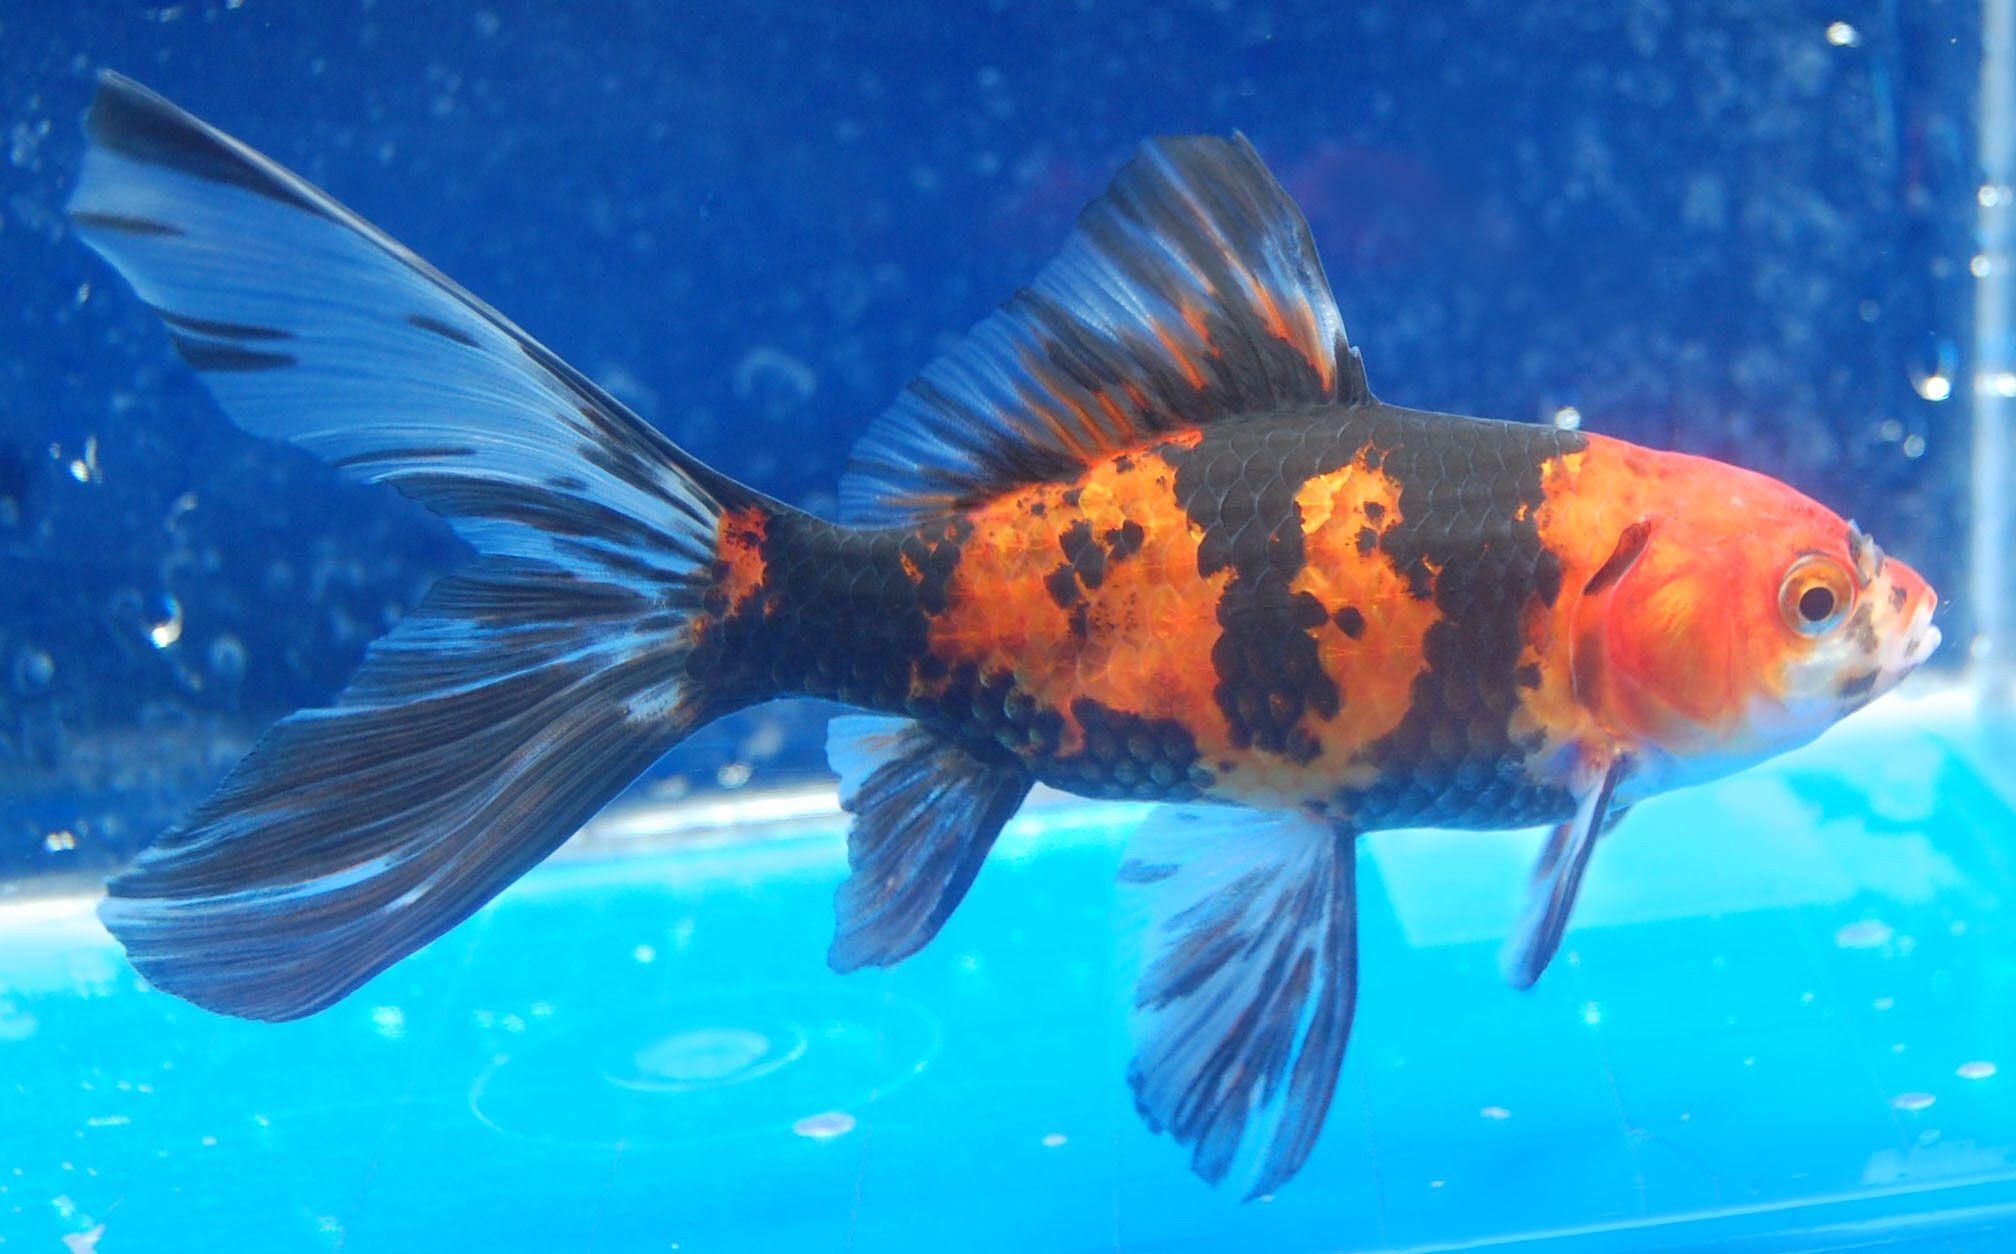 Goldfish tiger stripes shubunkin goldfish for the pond for Tiger striped fish